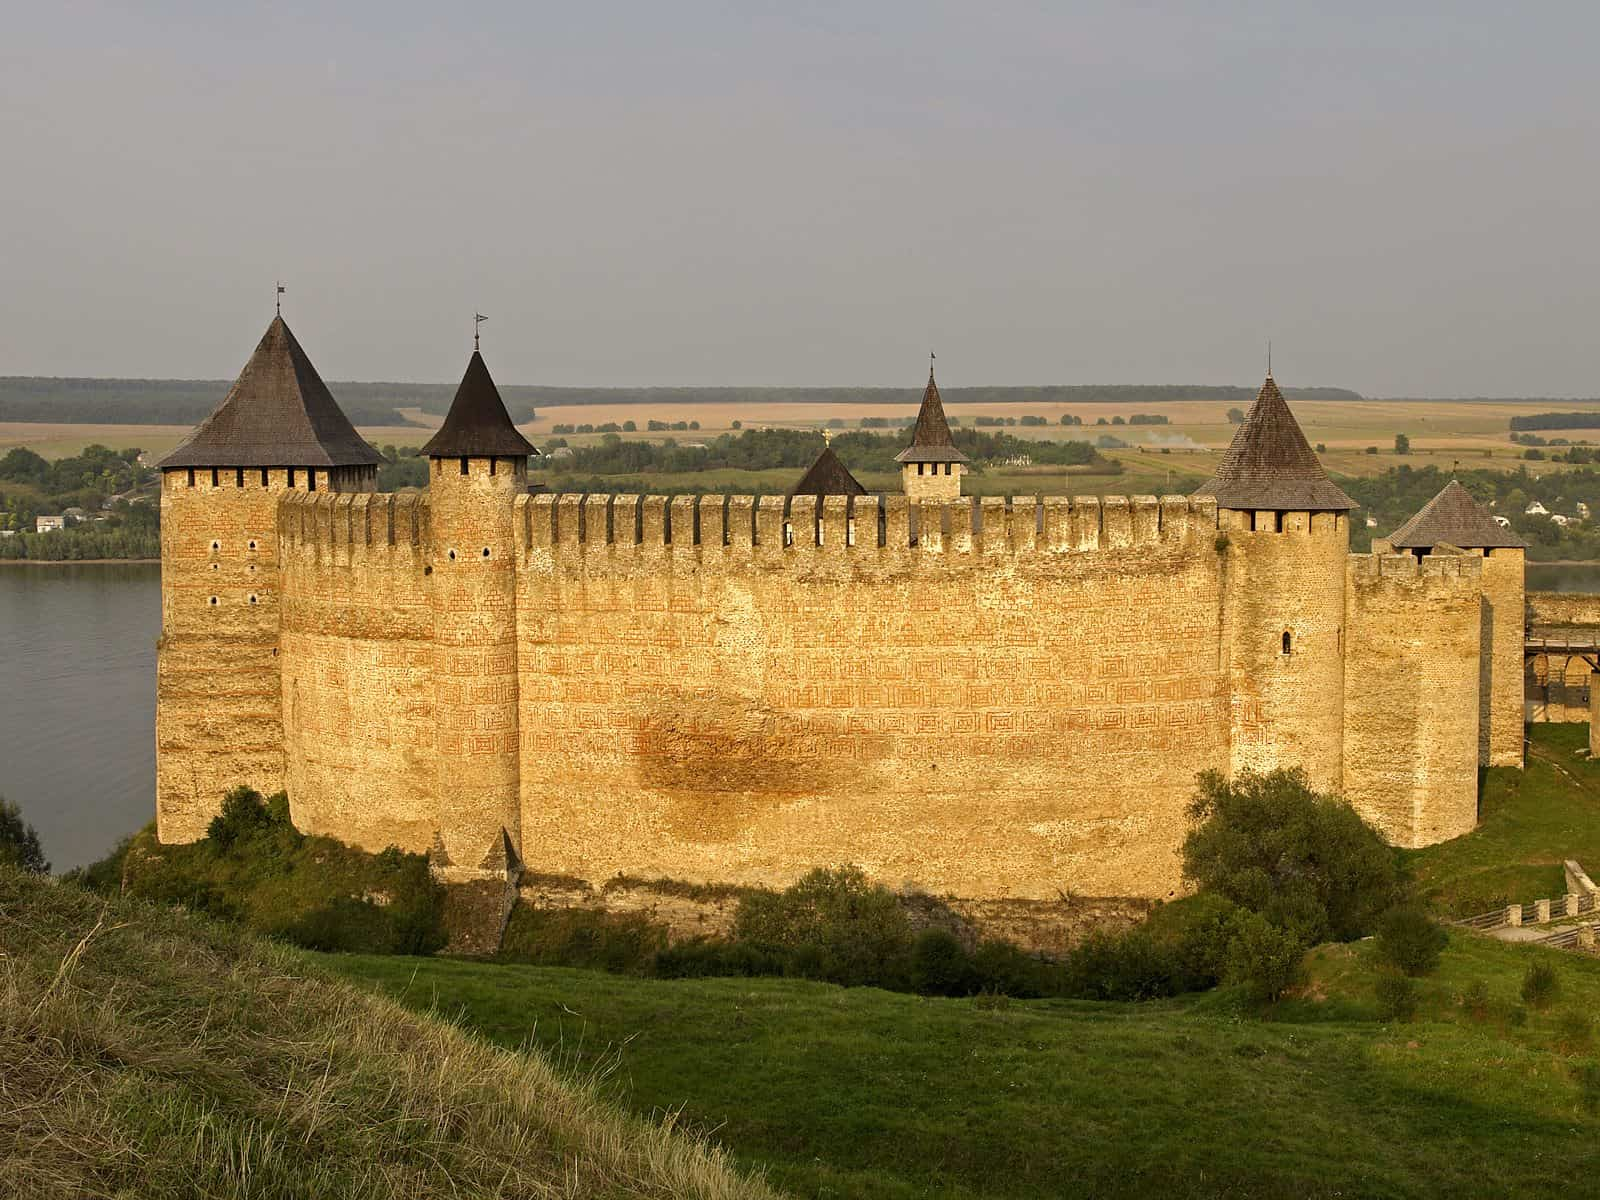 Castle Wallpaper 017